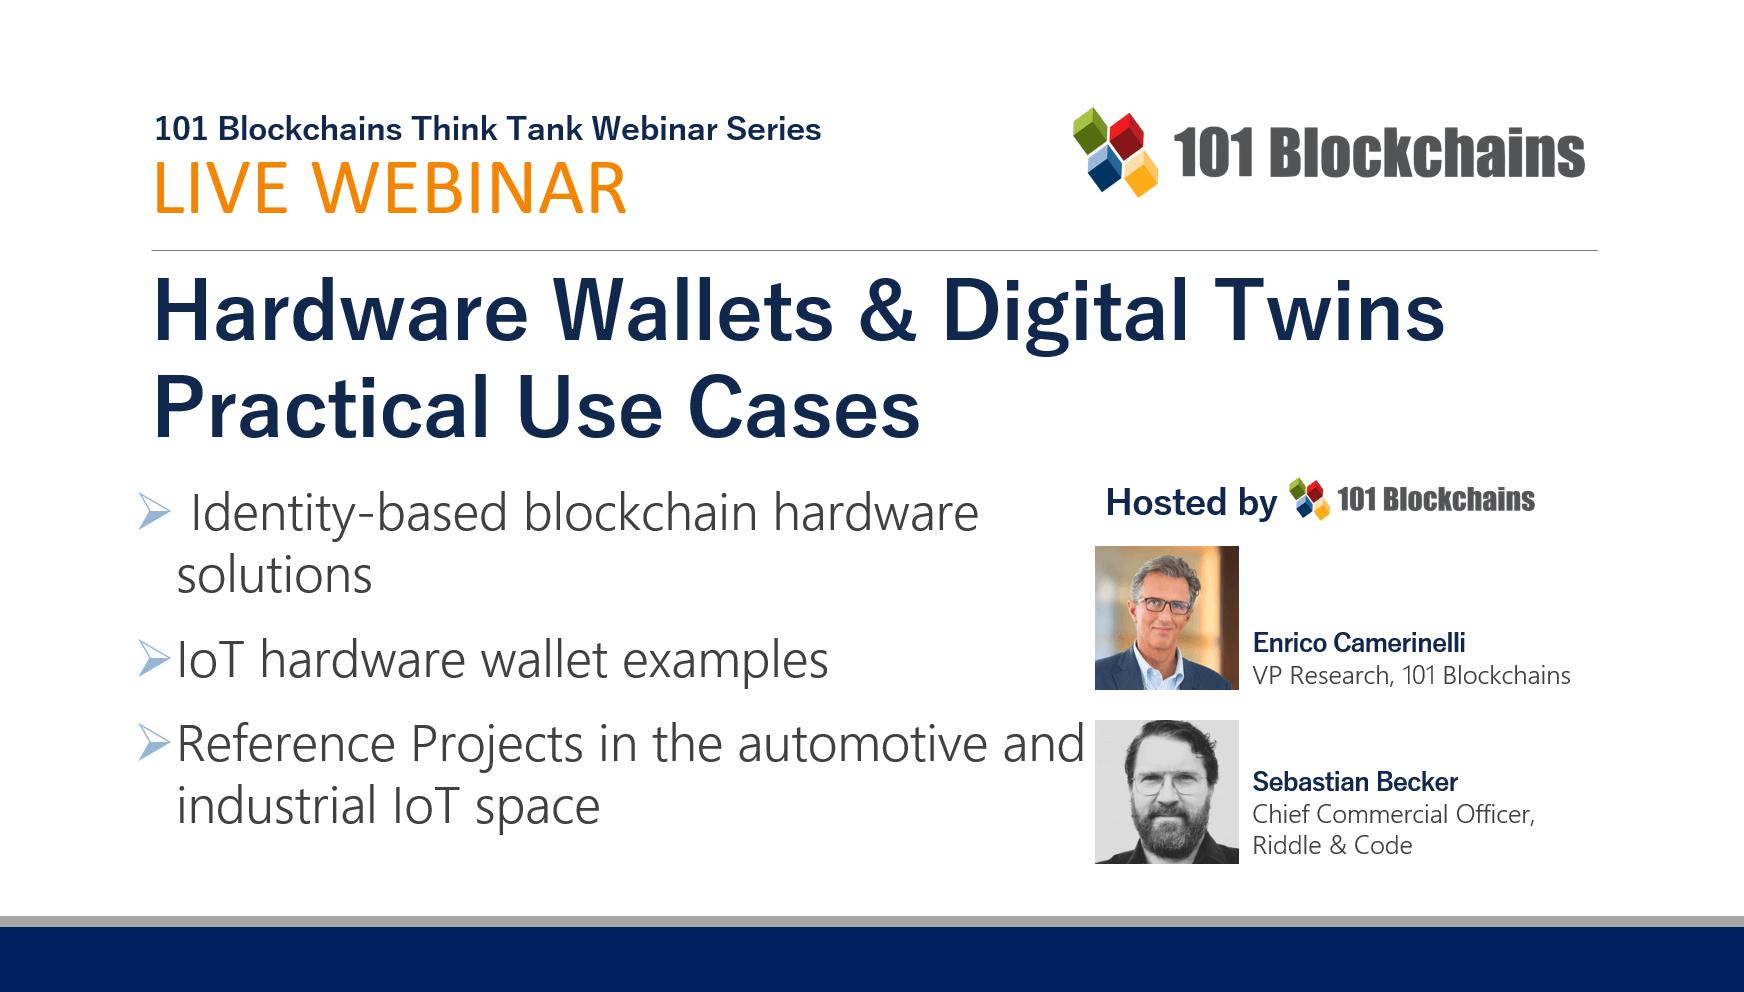 hardare wallets and digital twins webinar